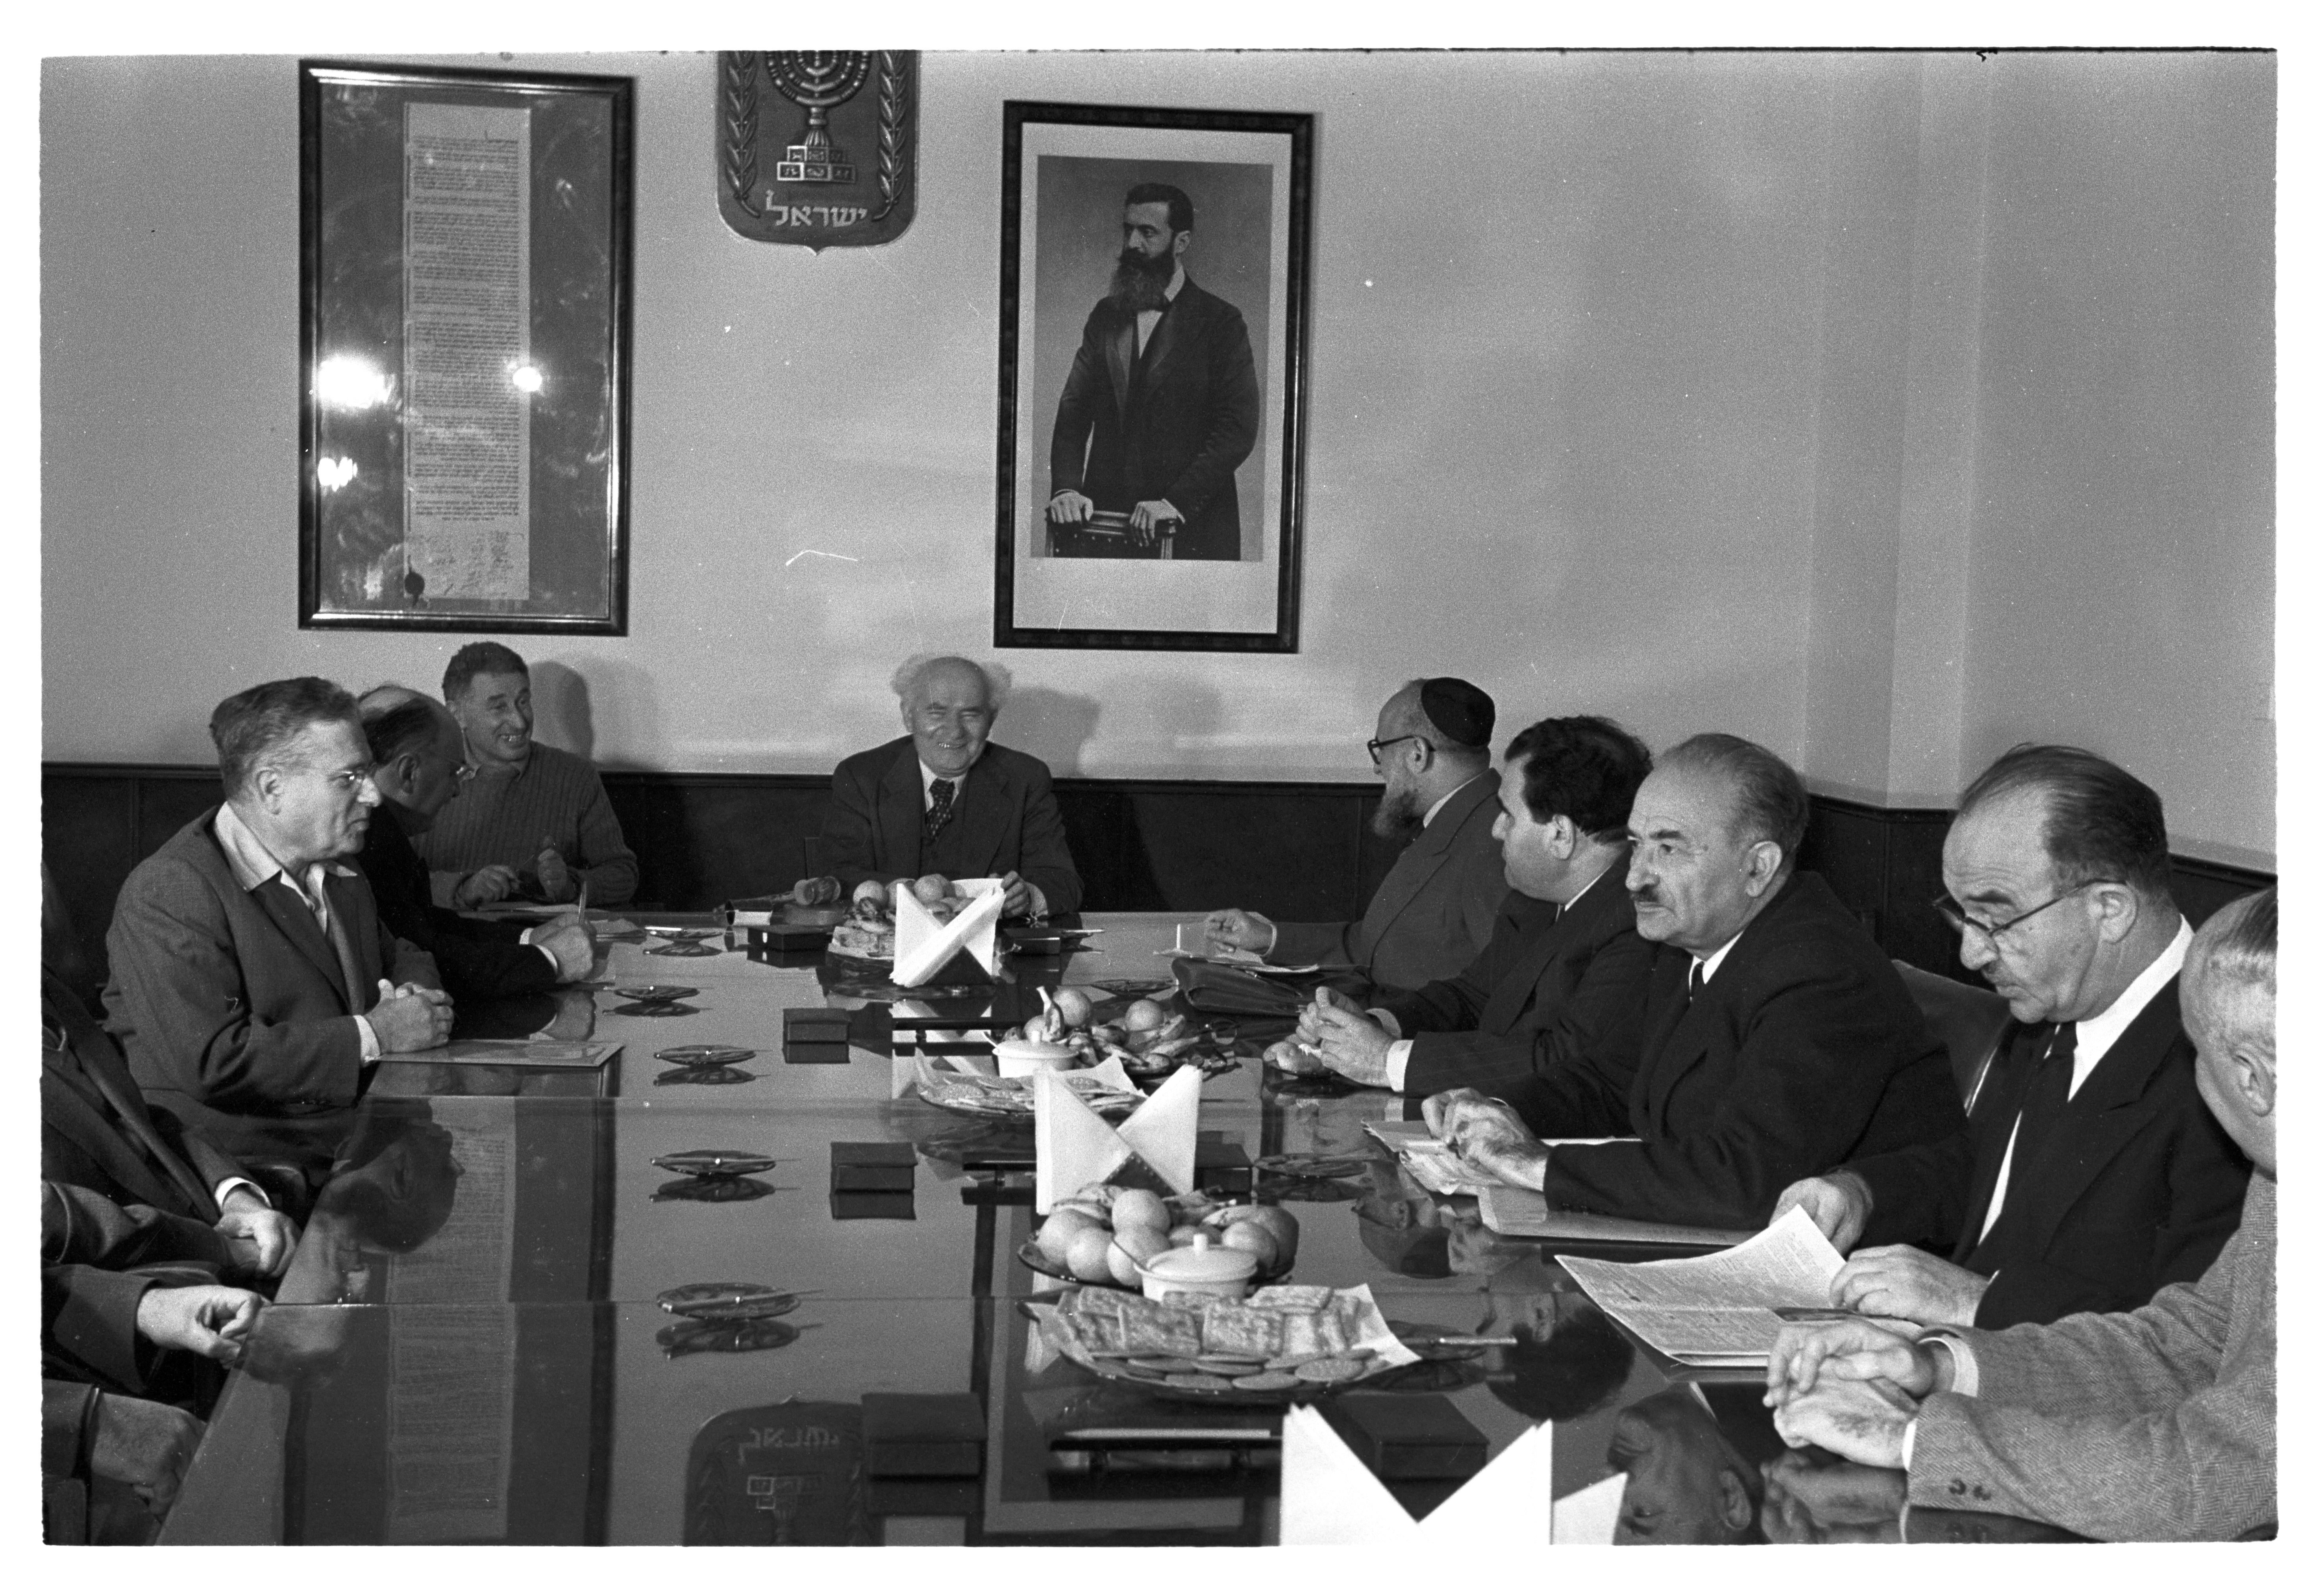 На стене в комнате правительства, рядом с портретом Герцля, - Декларация независимости. Во главе стола - Бен-Гурион. Фото 1956 года, автор - Давид Рубингер